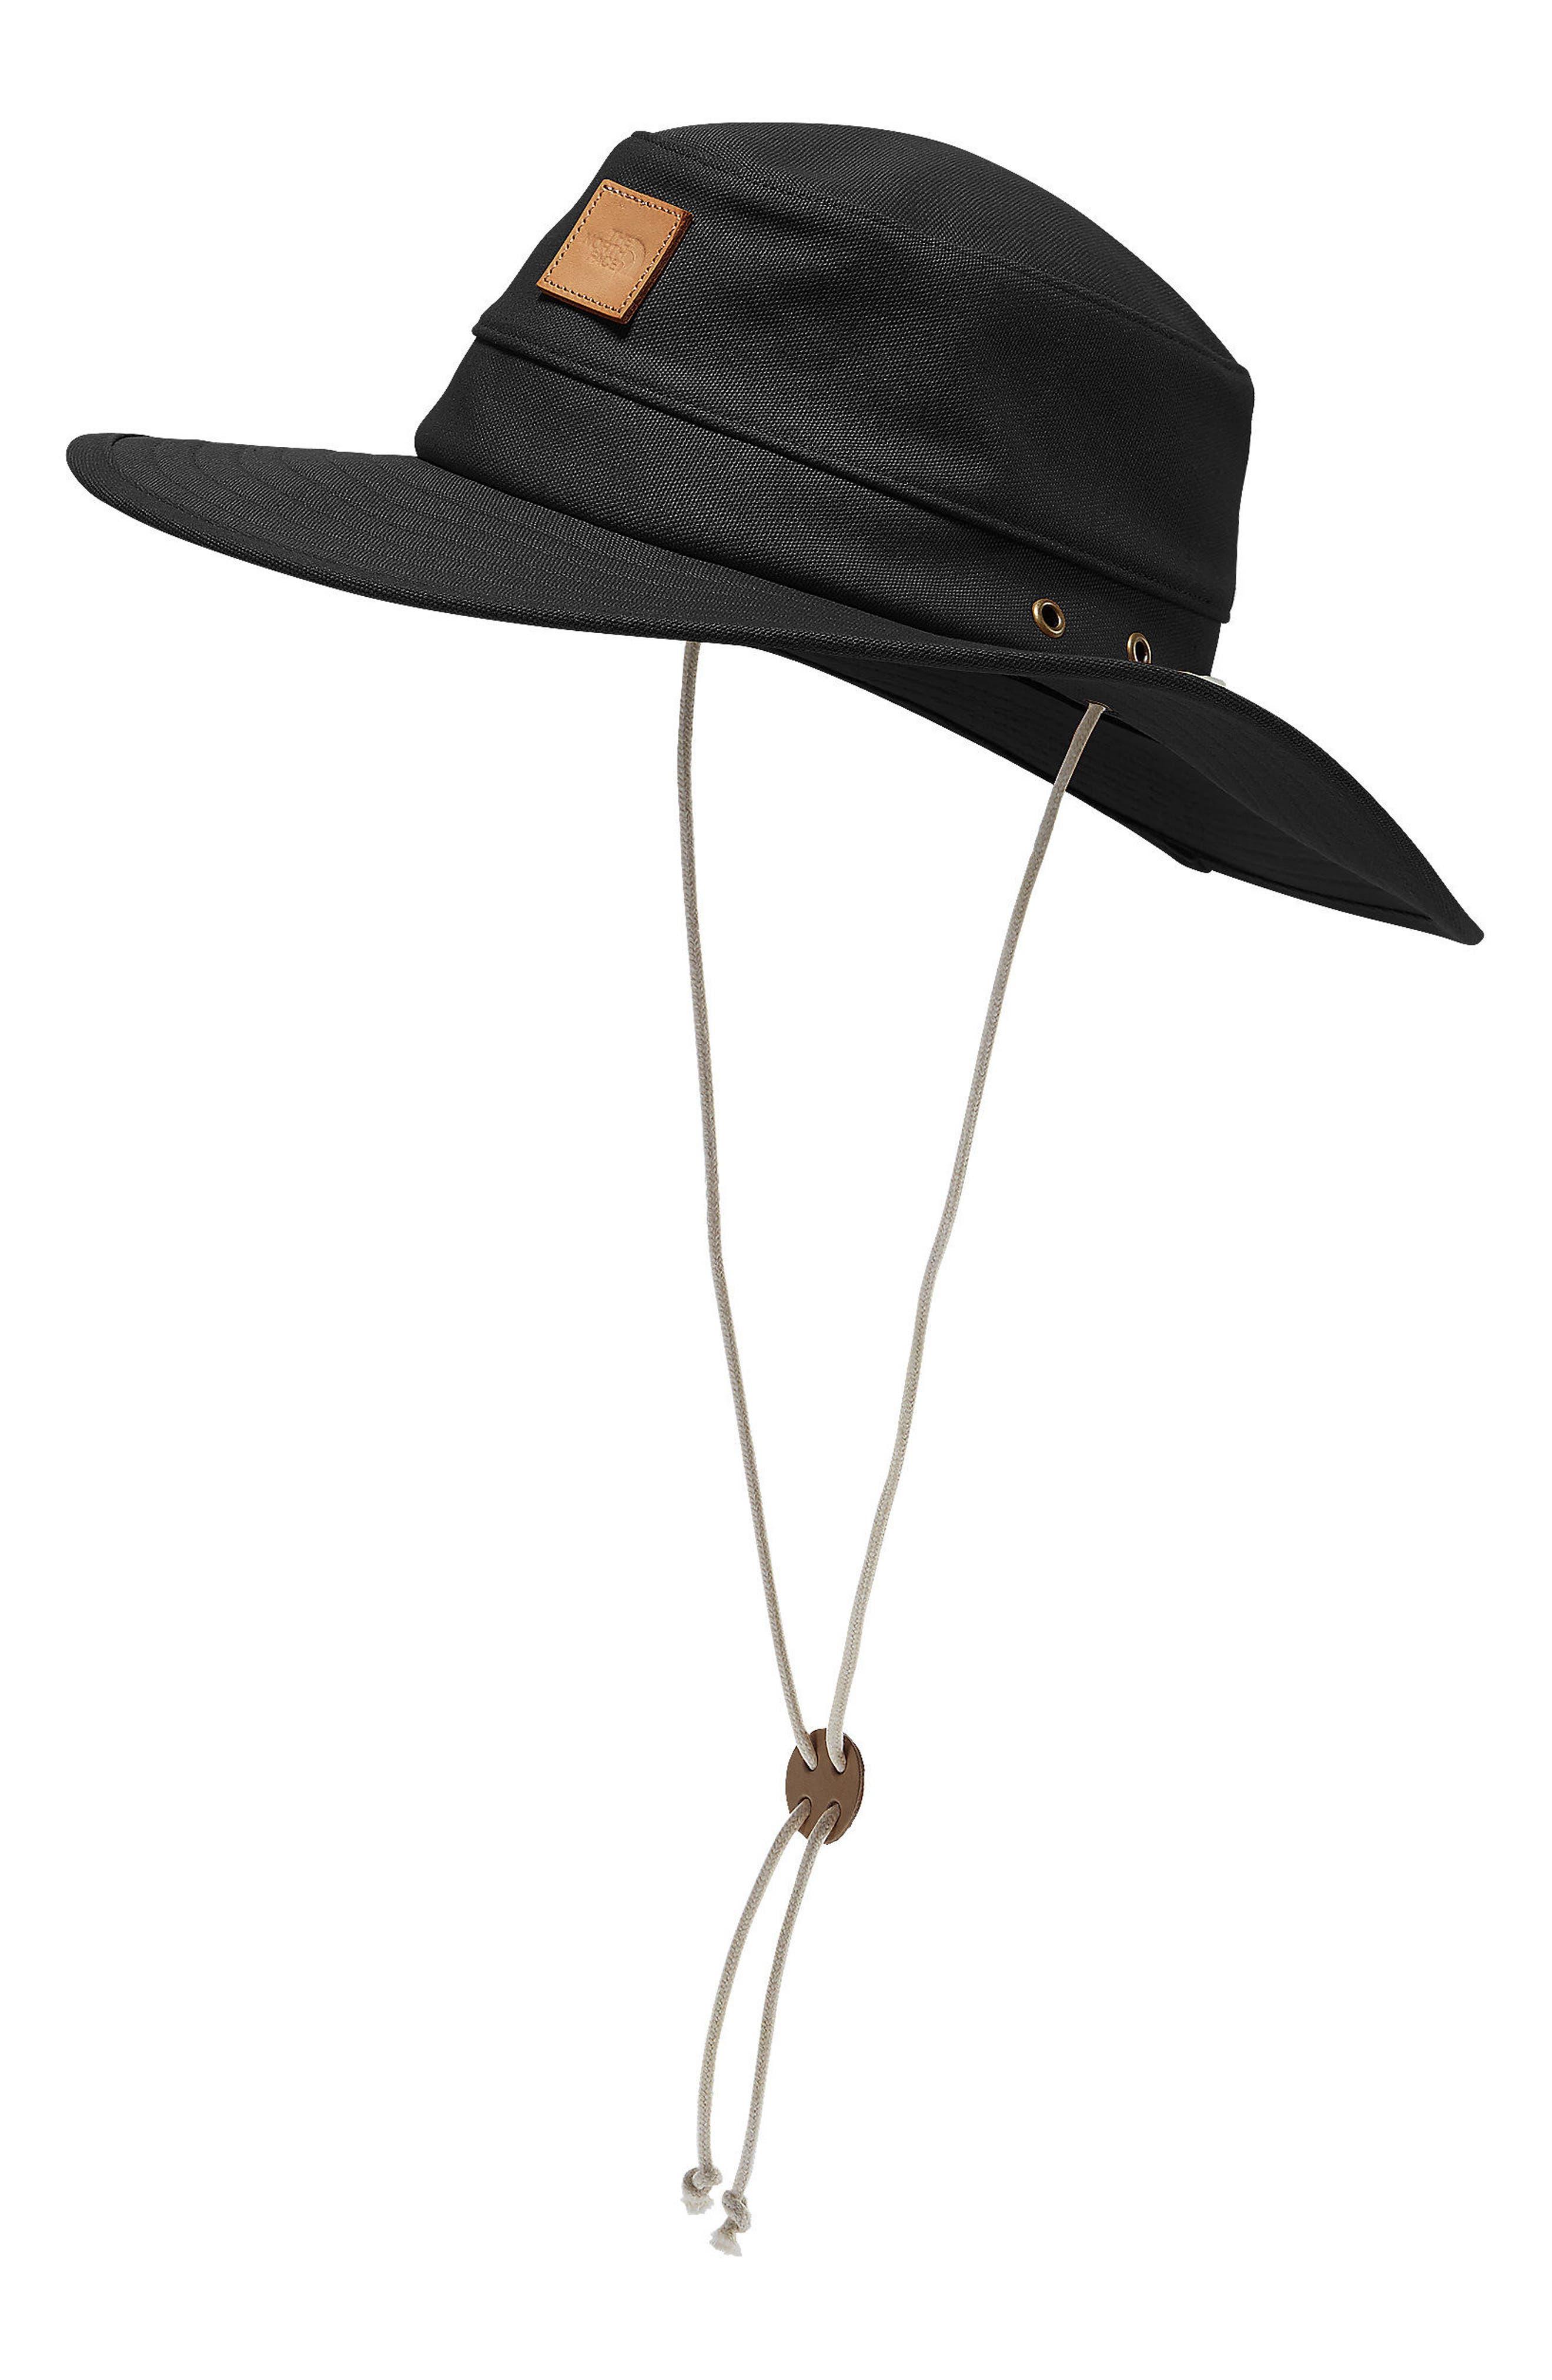 Naturalist Canvas Brimmer Hat,                             Main thumbnail 1, color,                             001